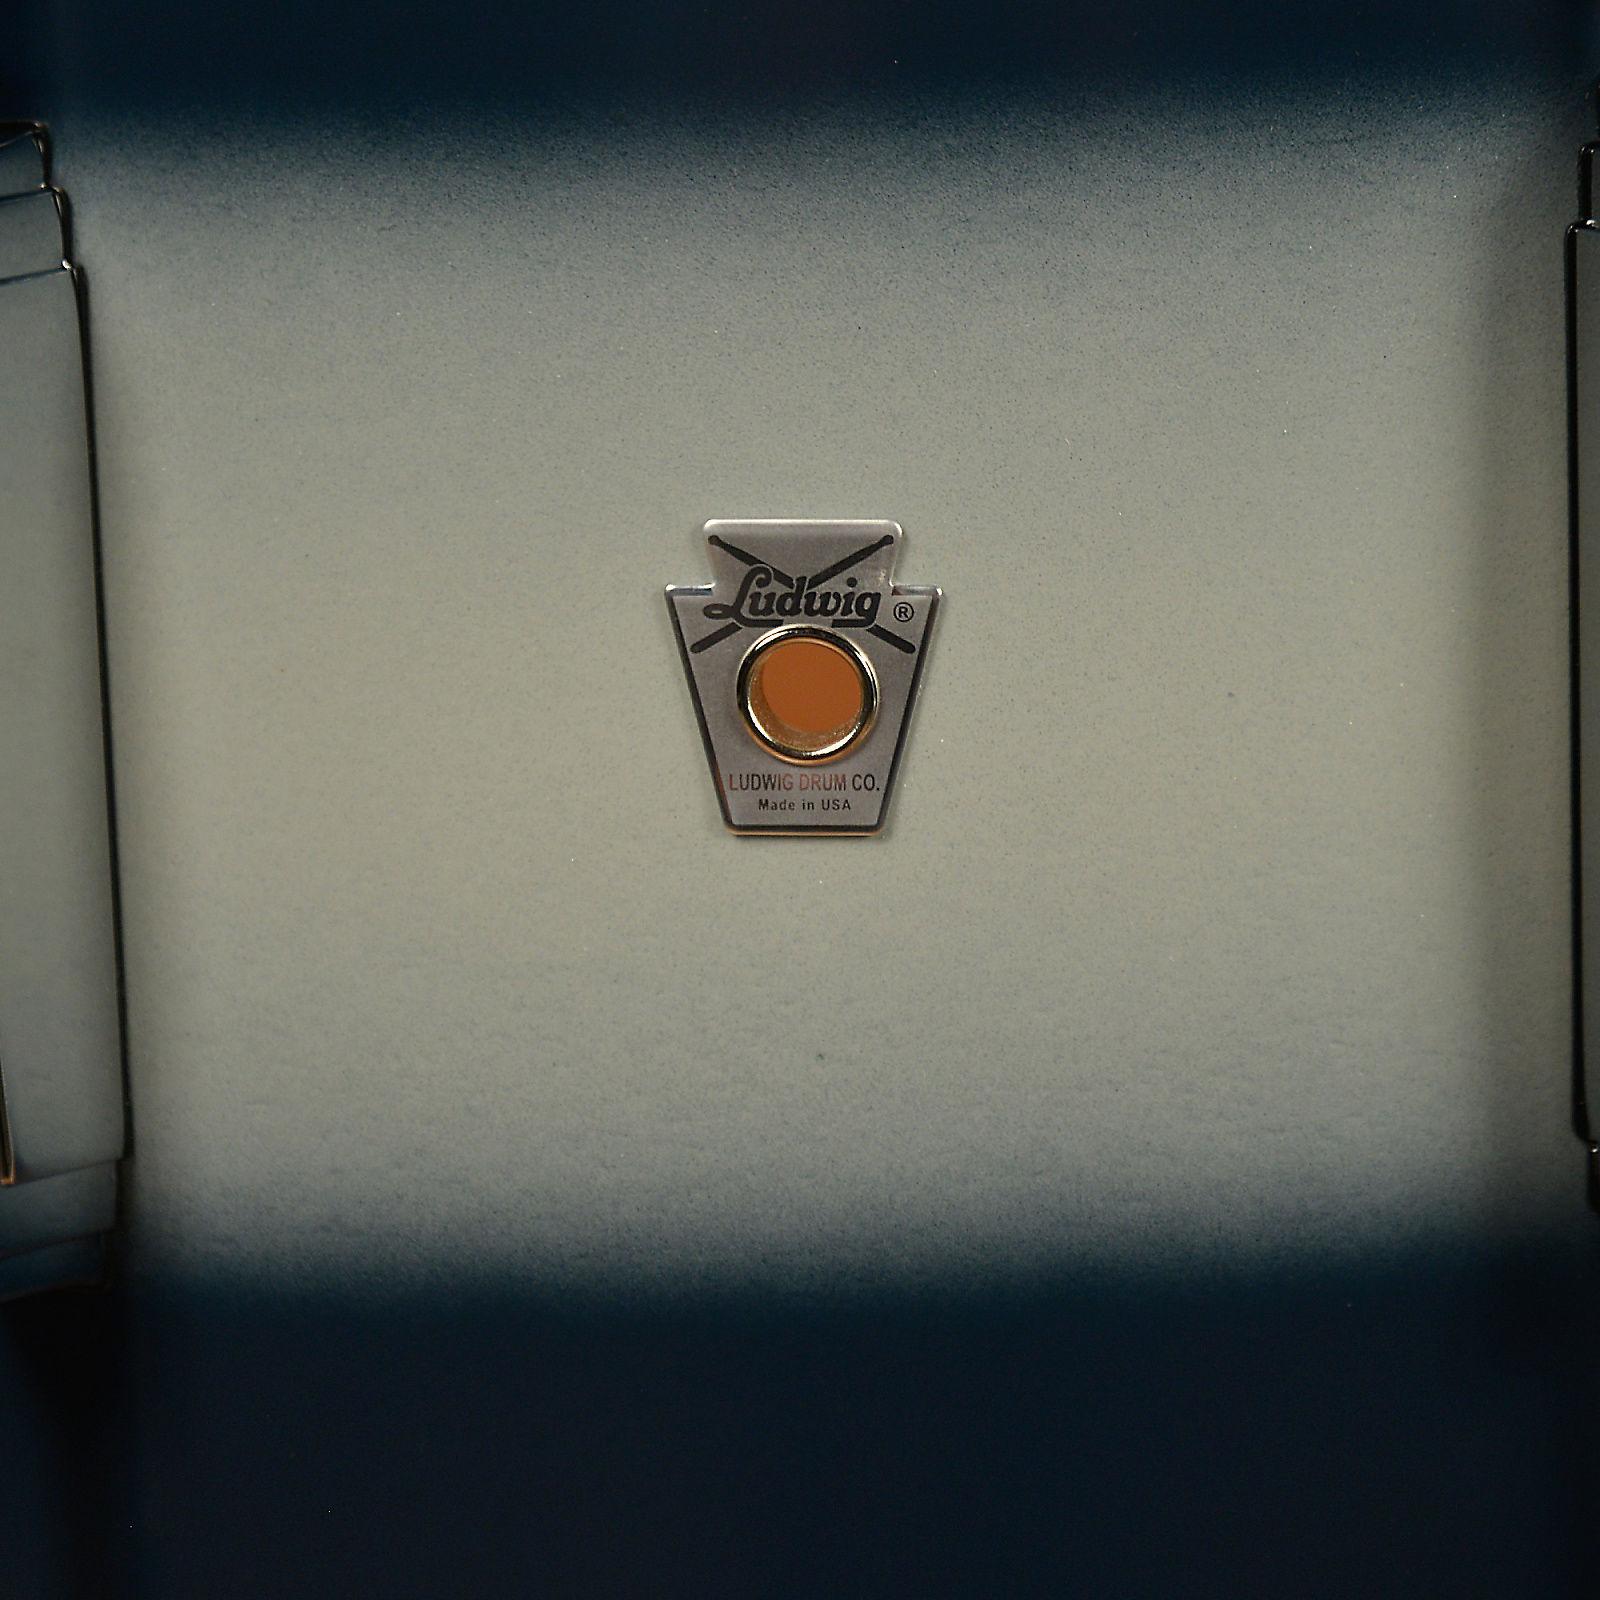 Ludwig badge dating